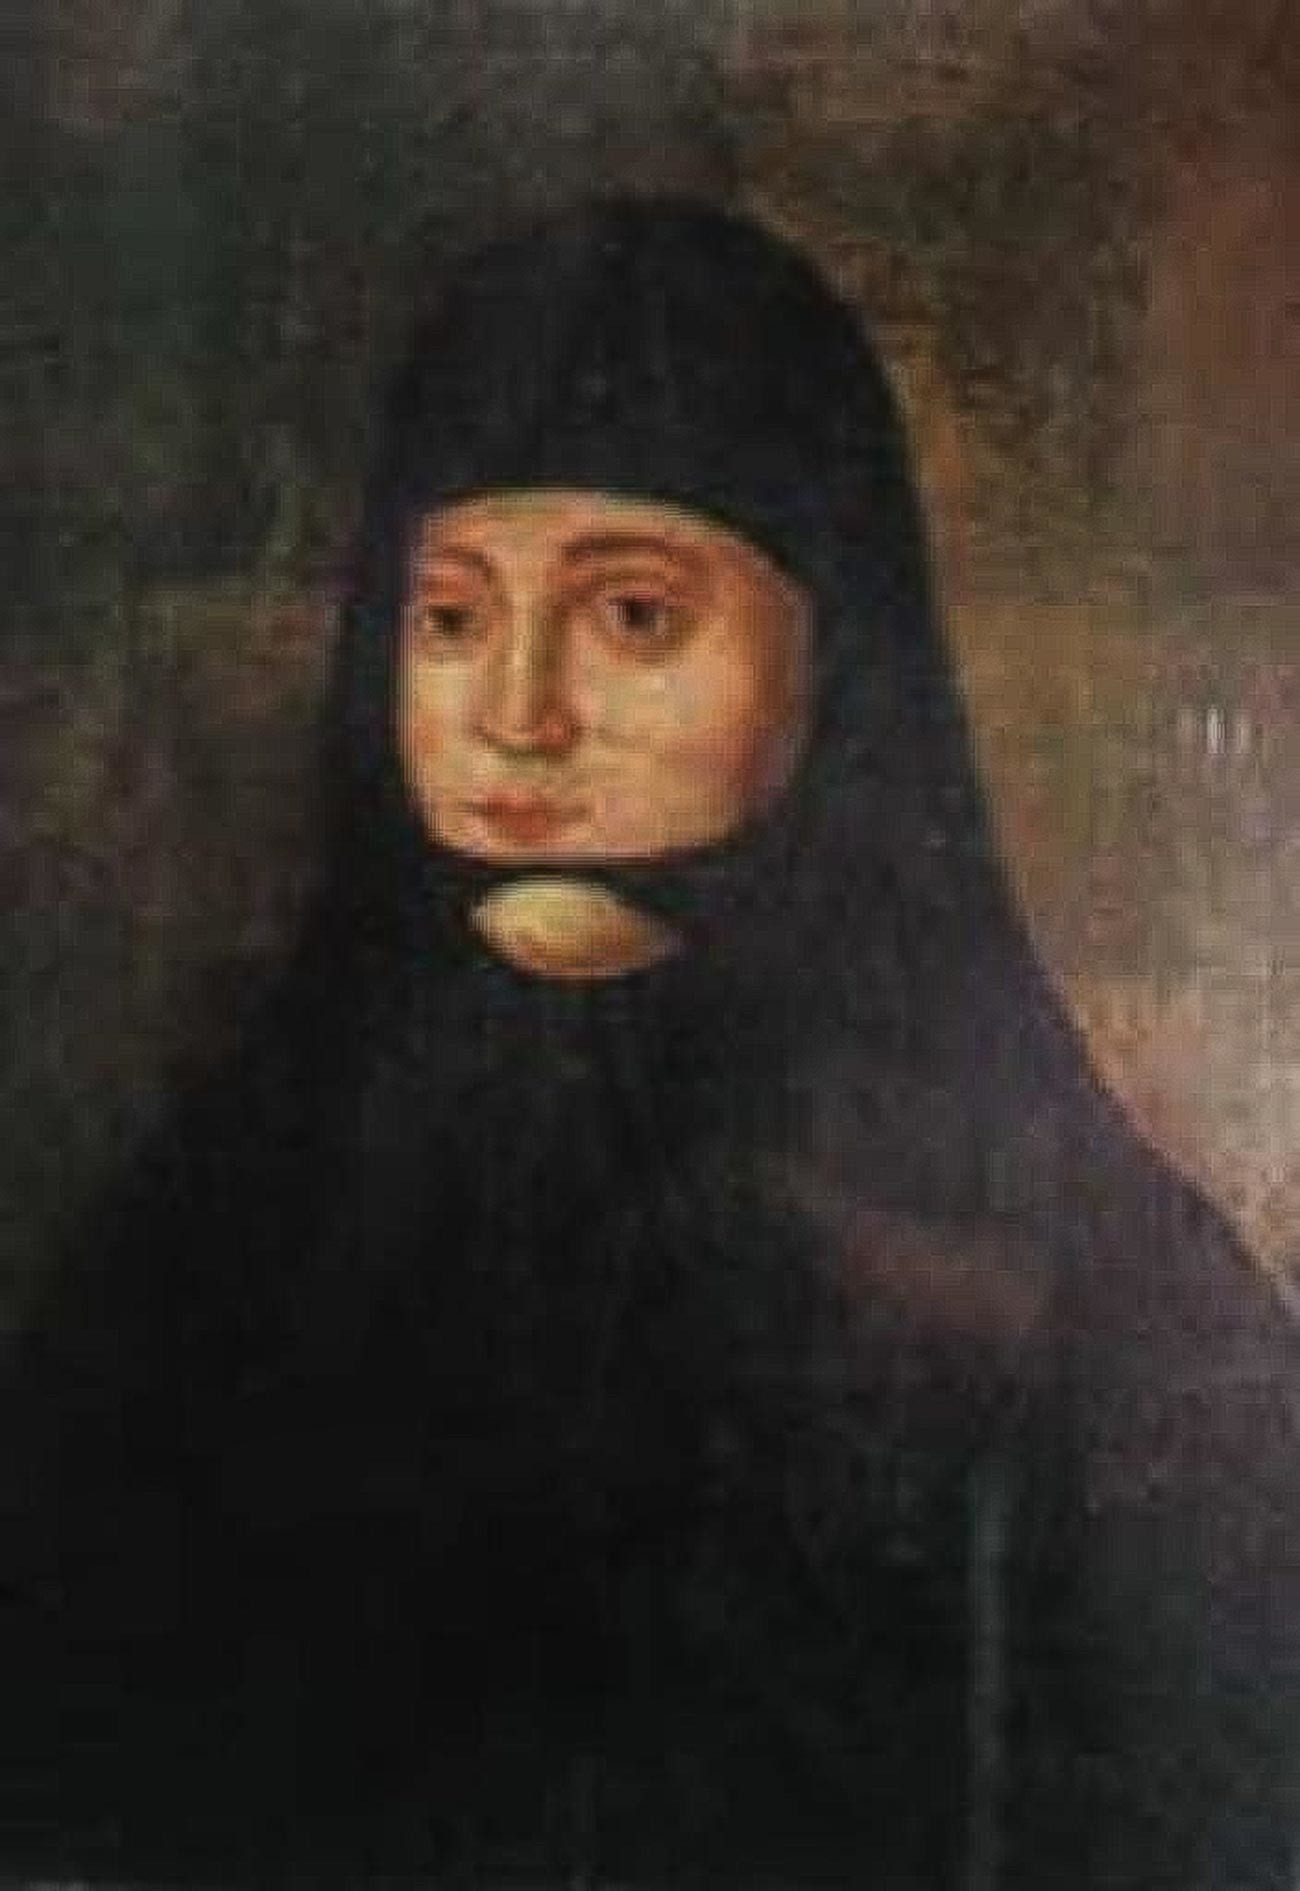 Solomonia Saburova, istri pertama Pangeran Agung Vasily III, menjadi biarawati di Biara Syafaat Suzdal.